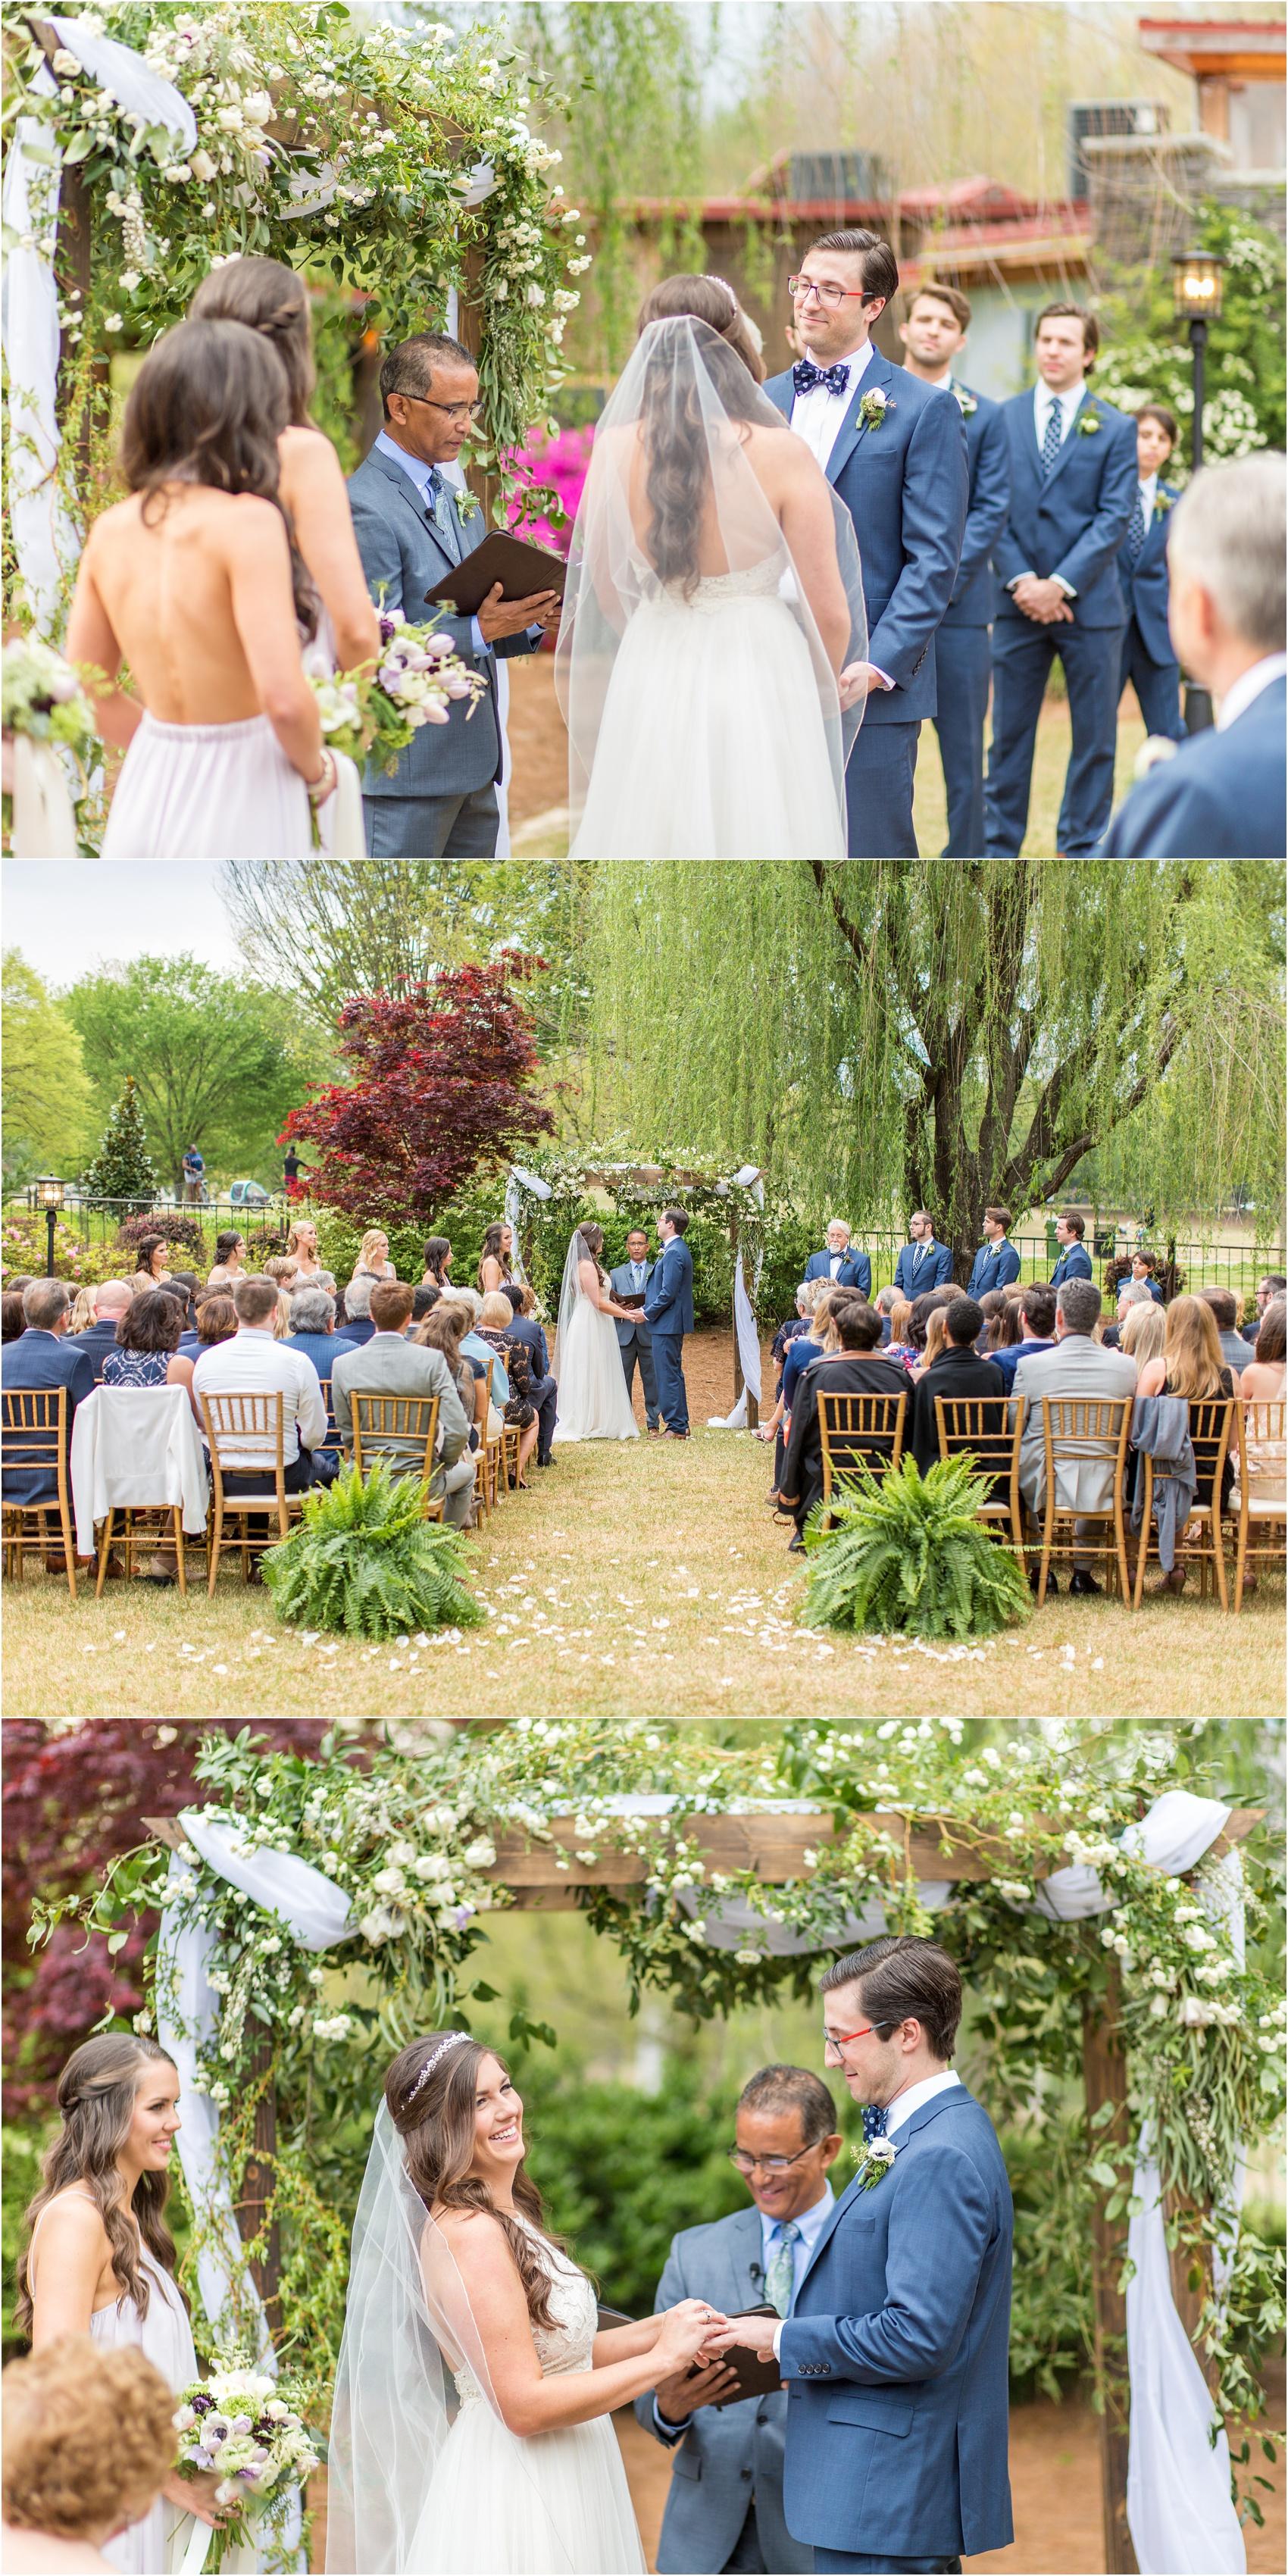 Savannah Eve Photography- Groseclose Wedding- Blog-70.jpg